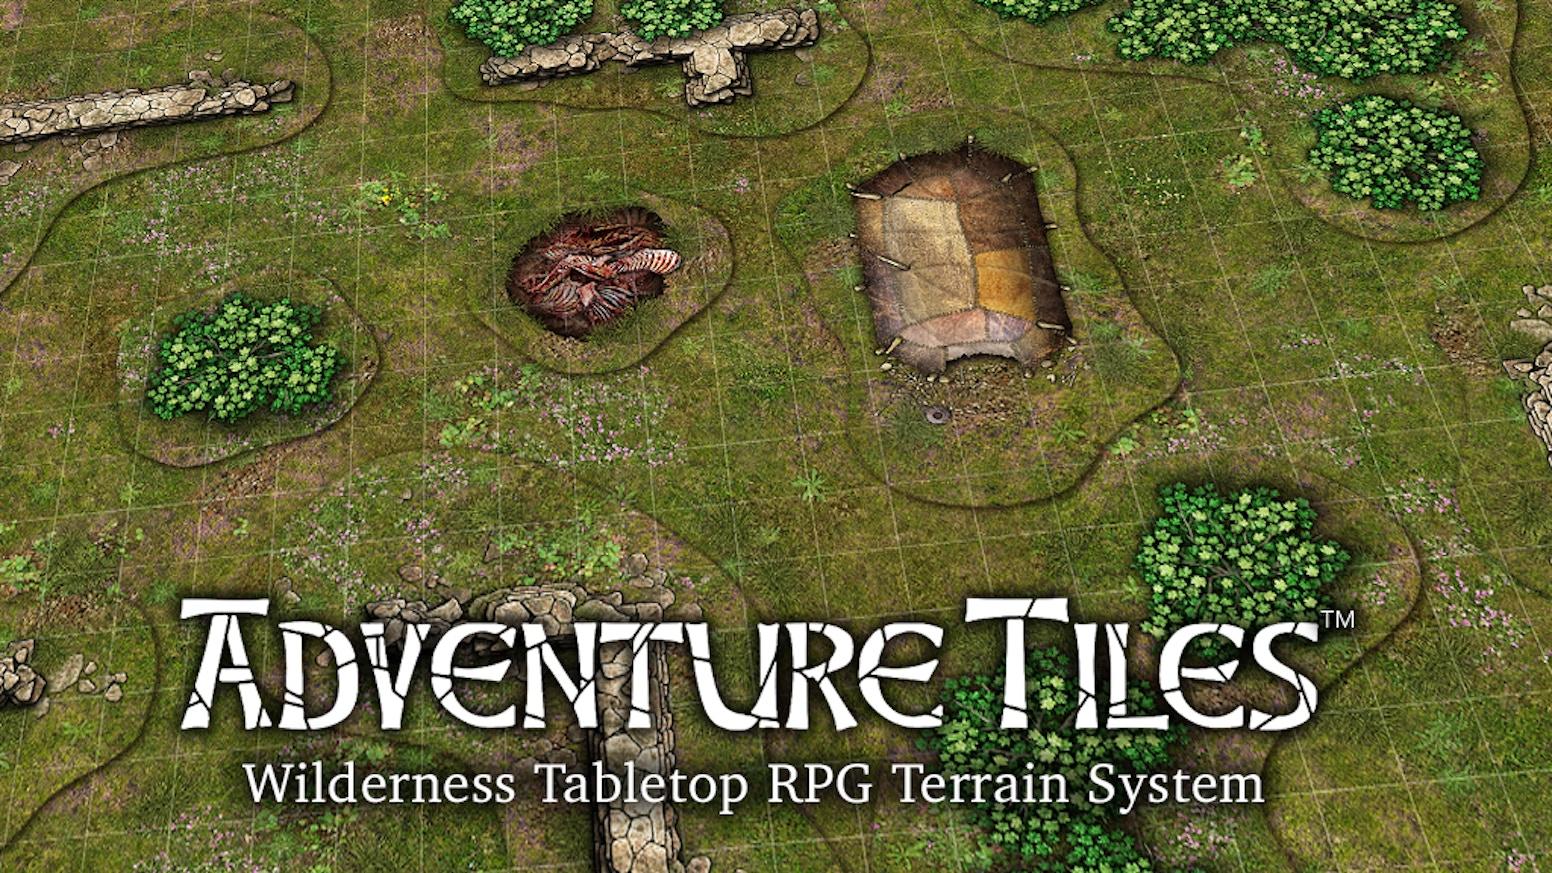 adventure tiles wilderness tabletop rpg terrain system by broken